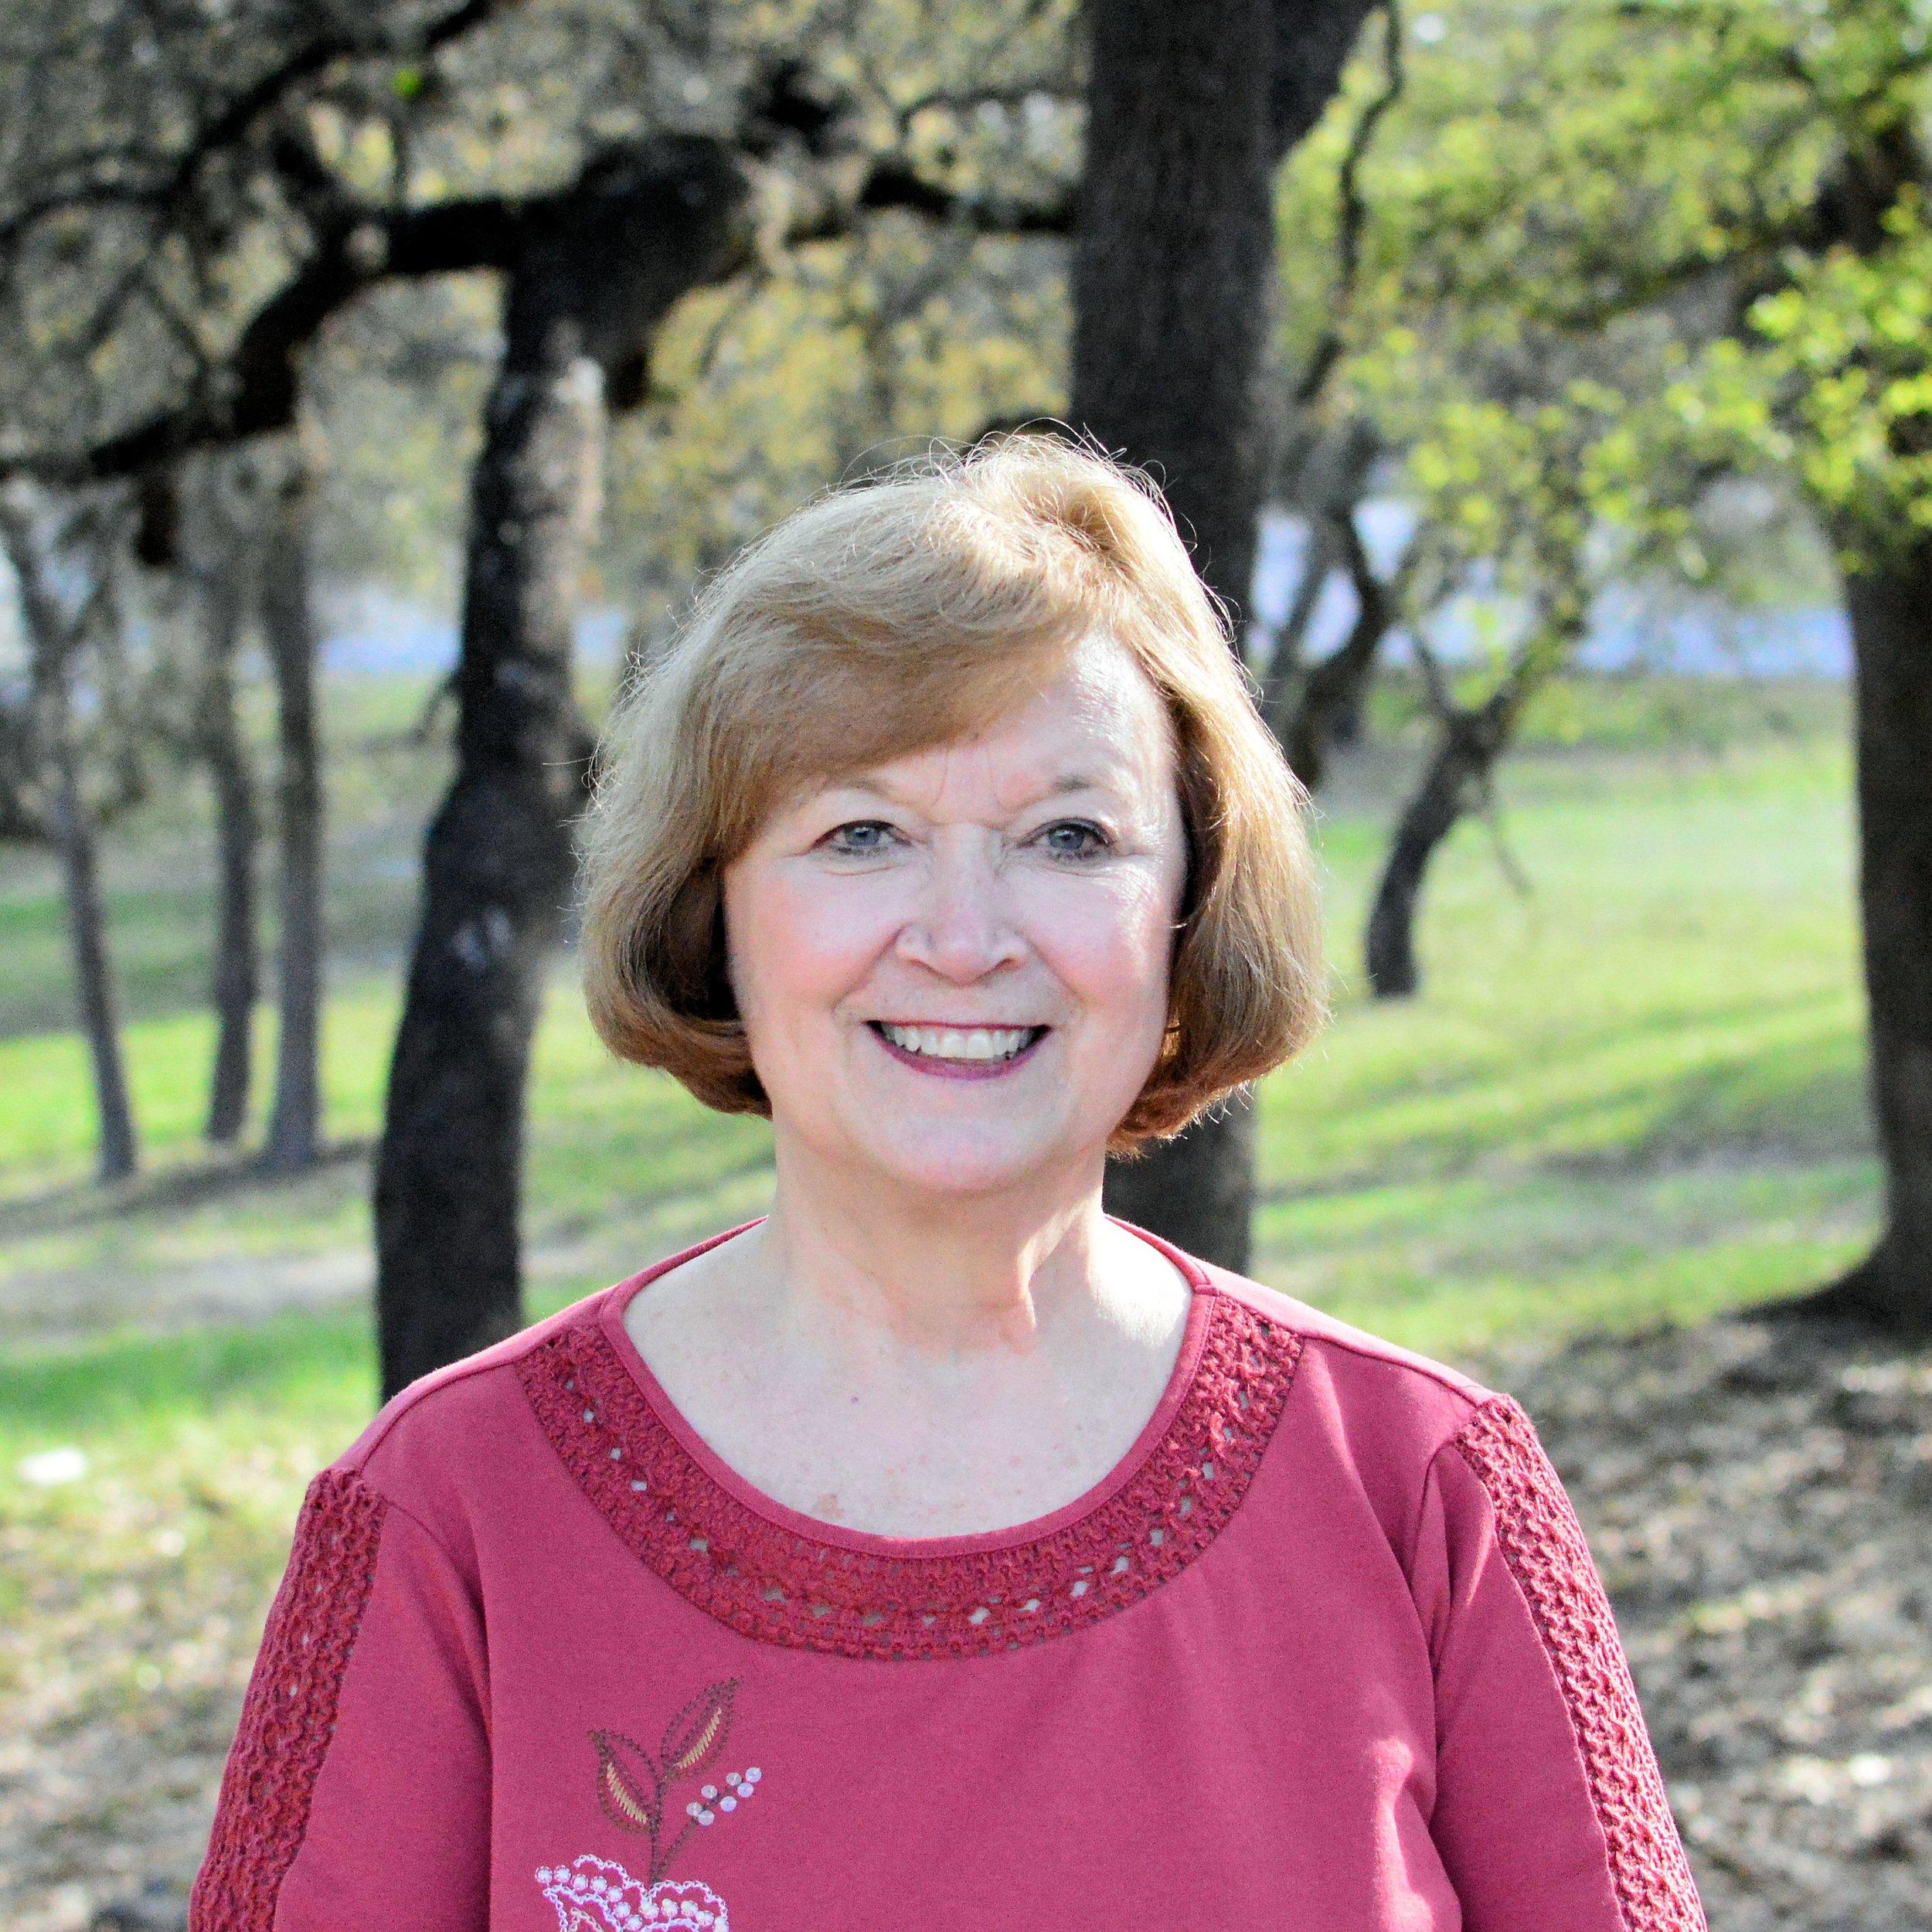 Scotta Williams - Secretarychurch@gracefellowshipabc.com